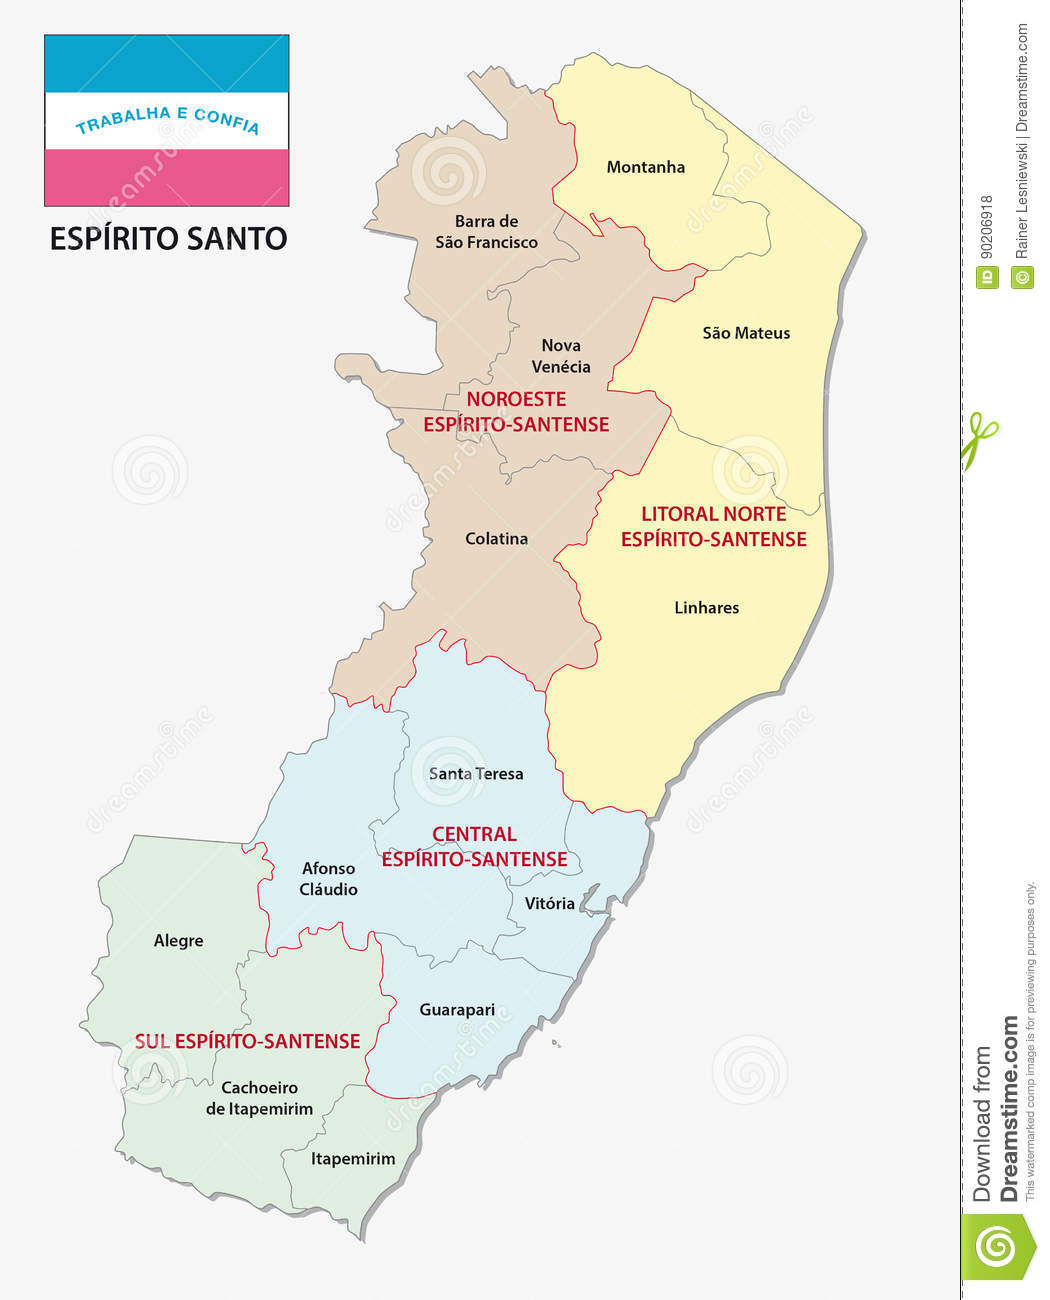 Mapas do Espírito Santo